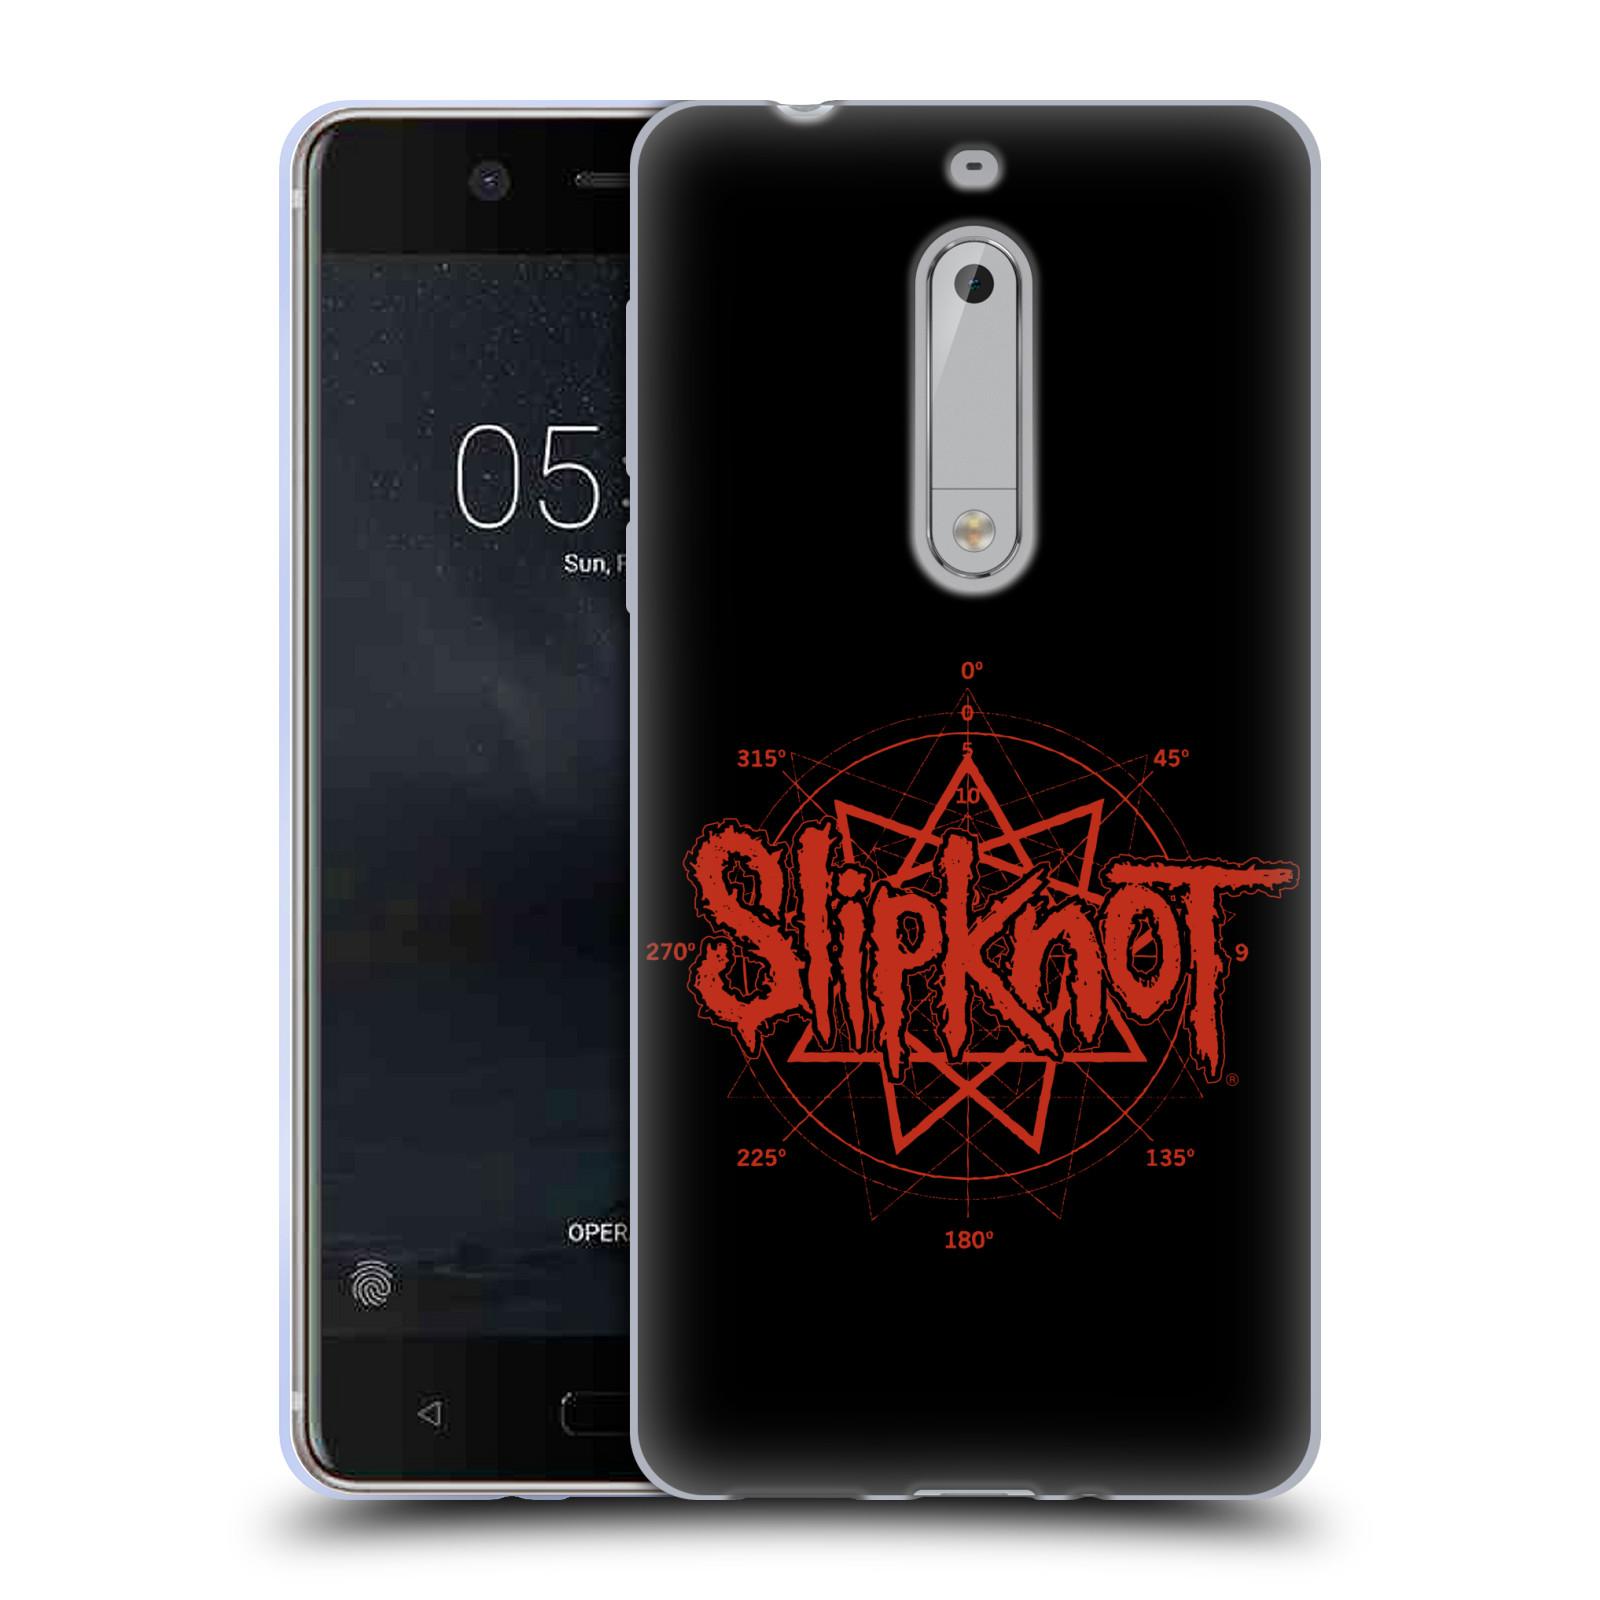 HEAD CASE silikonový obal na mobil Nokia 5 hudební skupina Slipknot logo